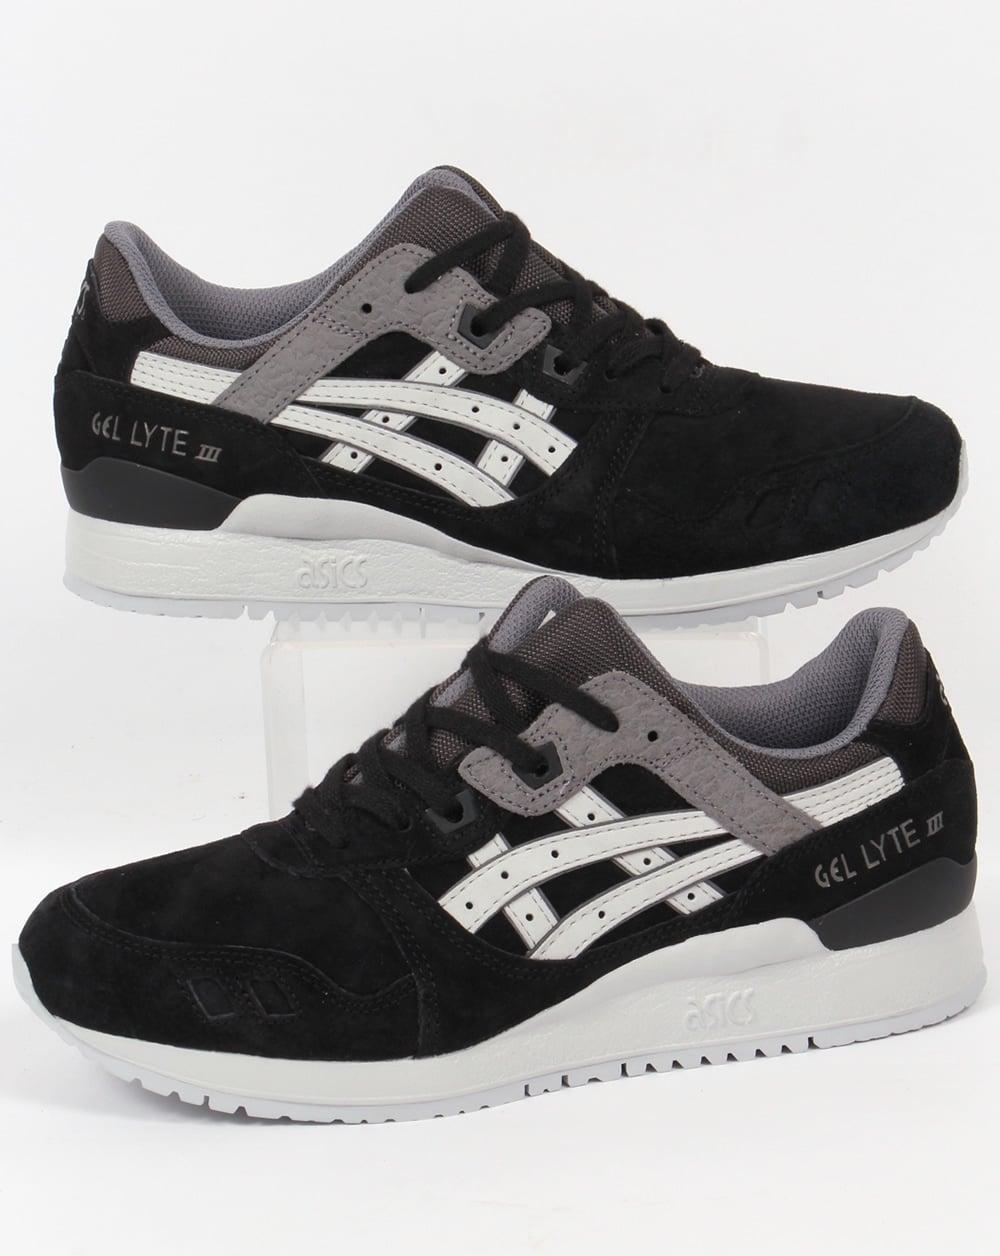 Asics Gel Lyte III Trainers Black/Grey